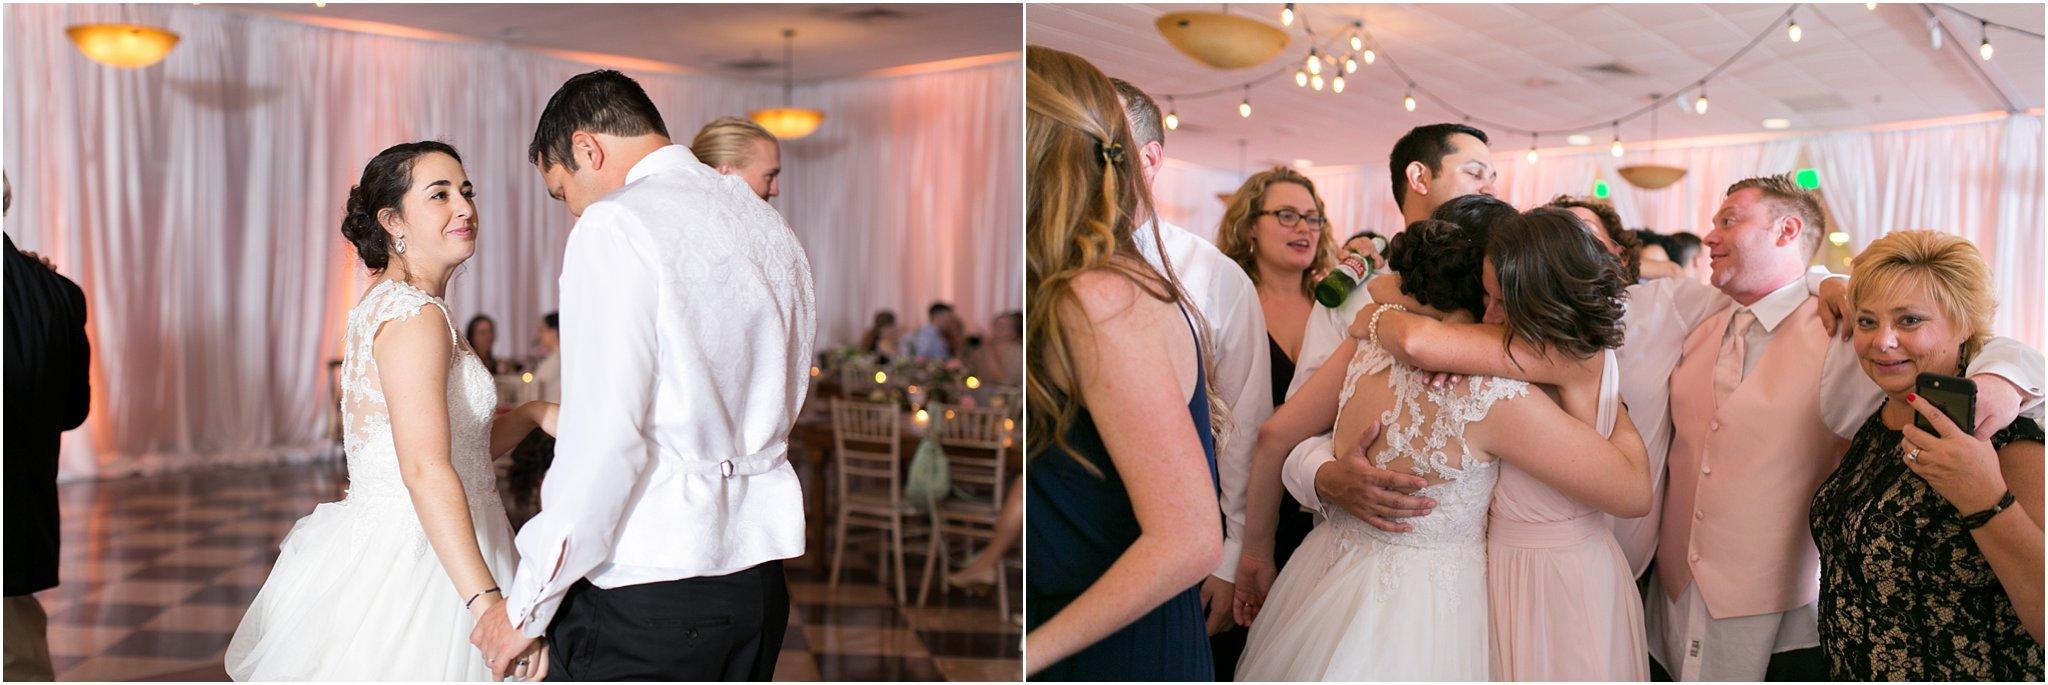 jessica_ryan_photography_virginia_wedding_photographer_wedding_hurricane_norfolk_botanical_gardens_hurricane_matthew_wedding_3646